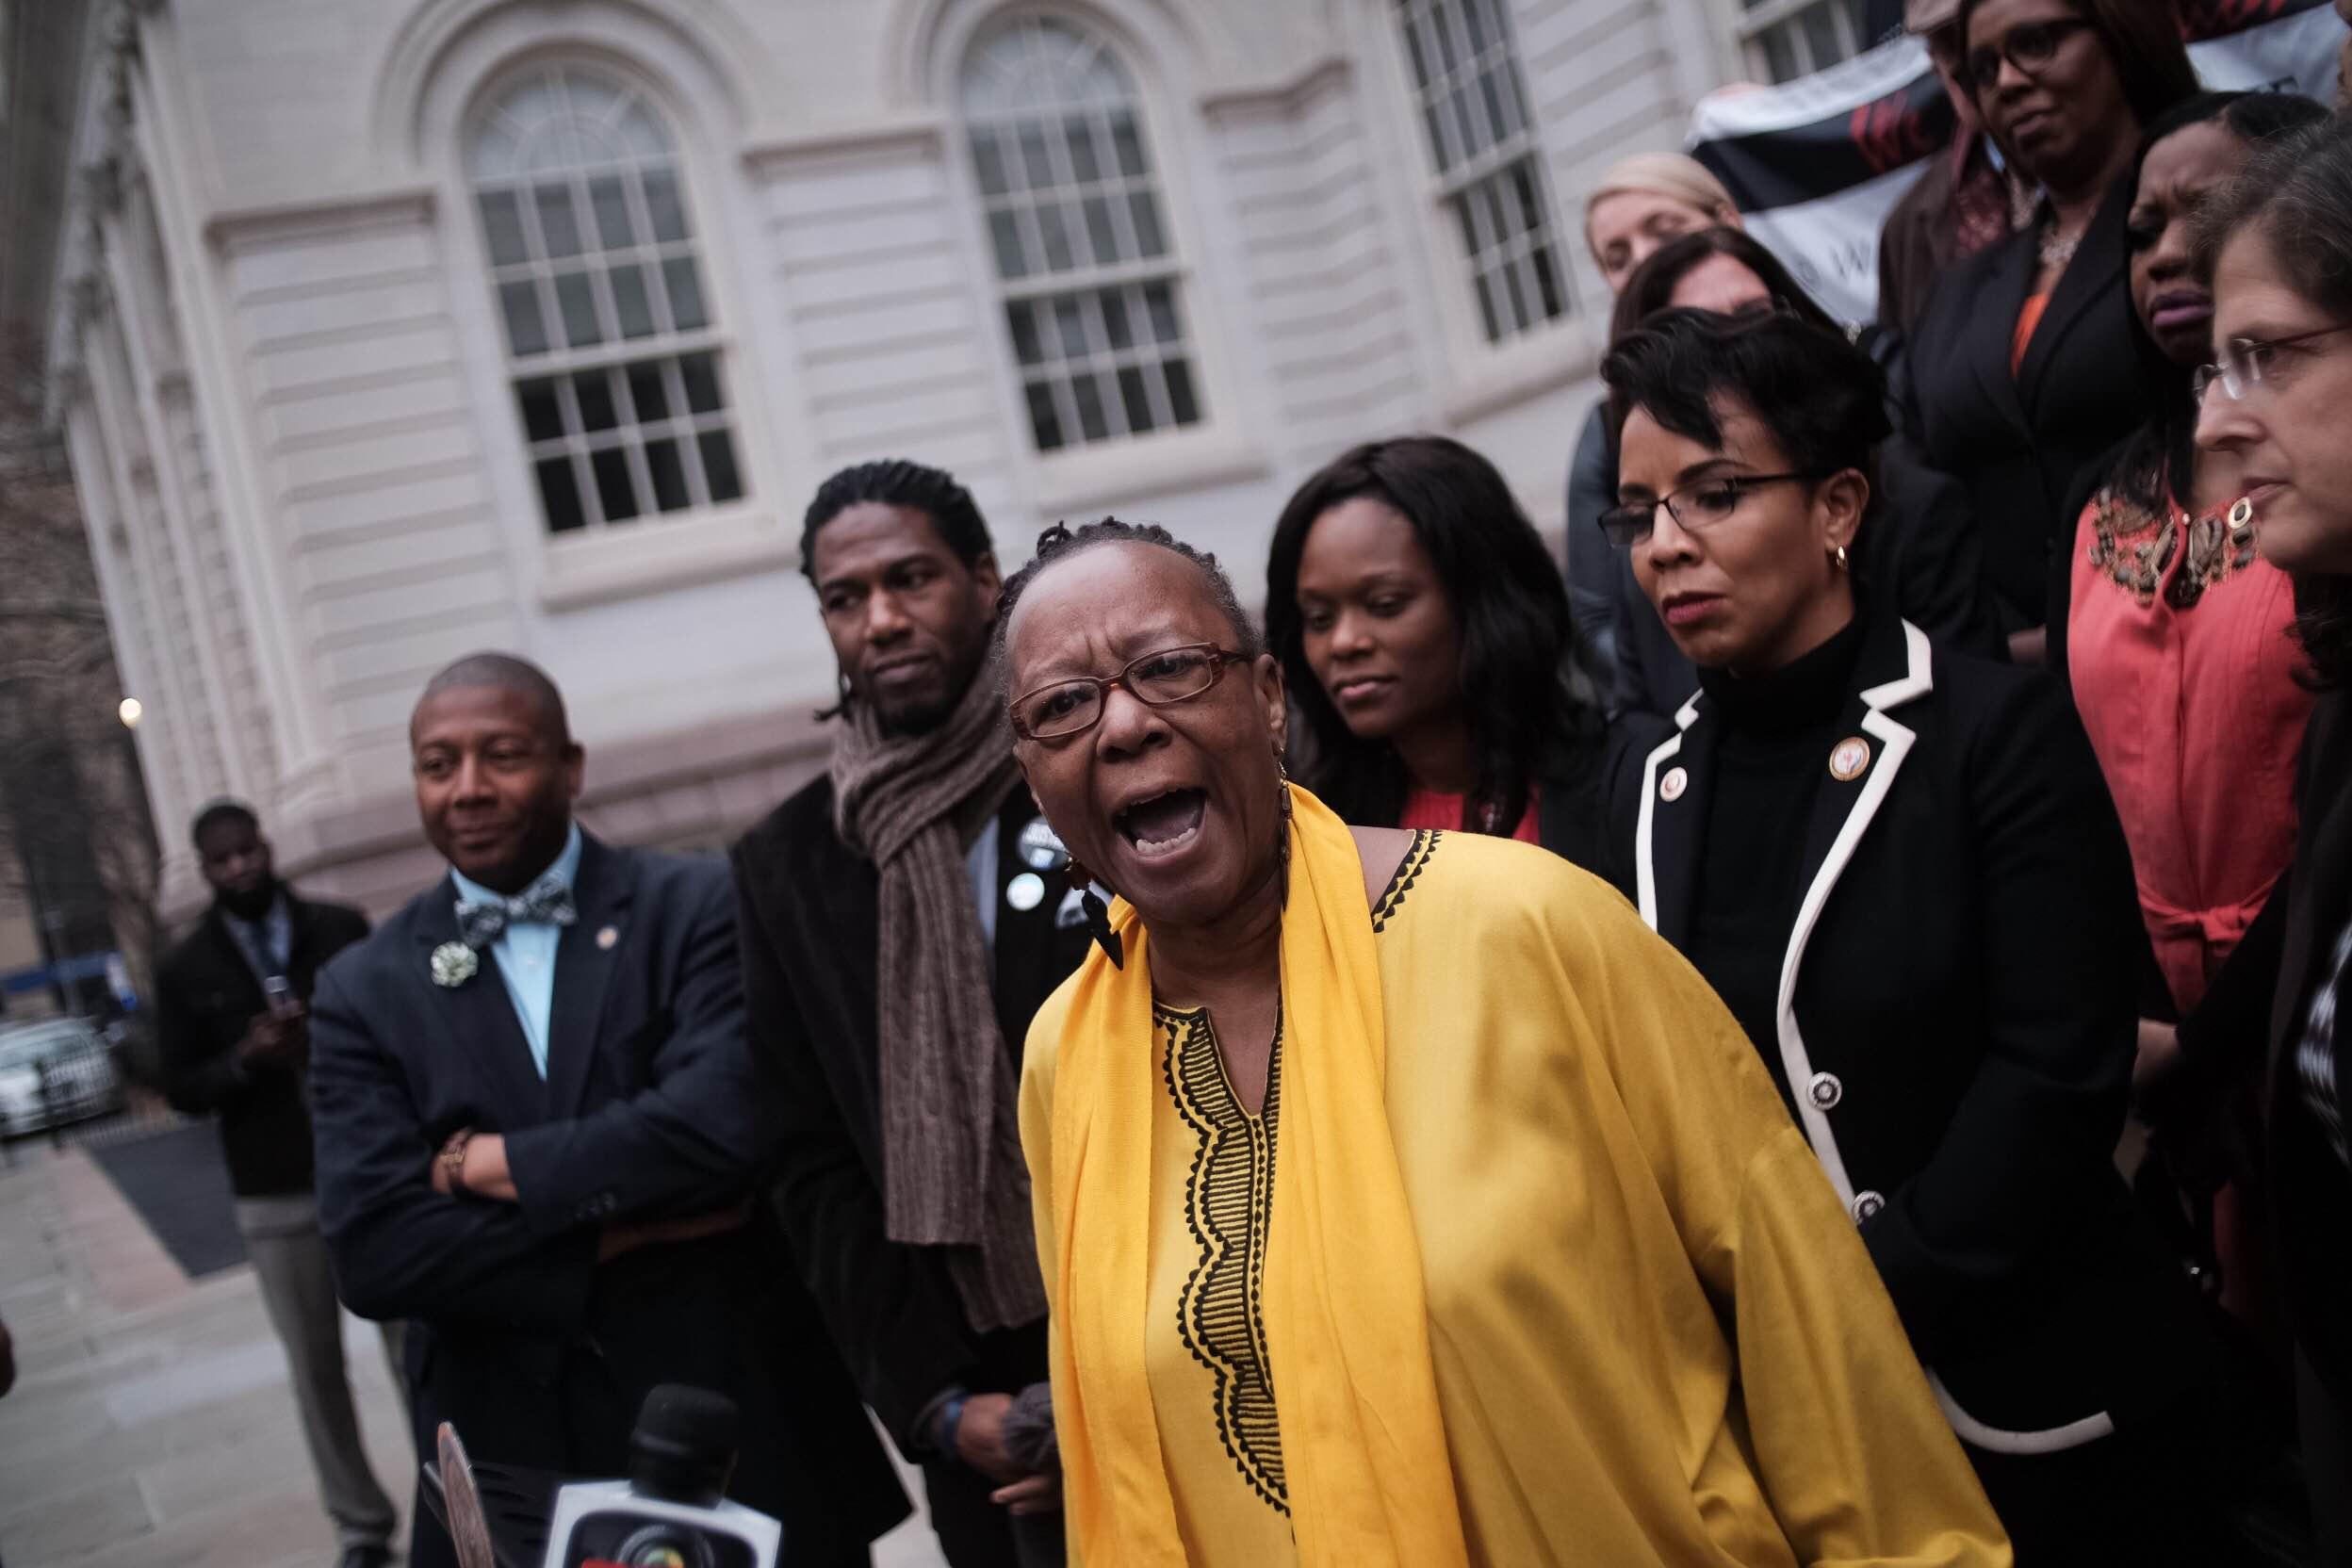 Bertha Lewis assailed Mayor Bill de Blasio today on the City Hall steps. (Photo: William Alatriste/New York City Council)